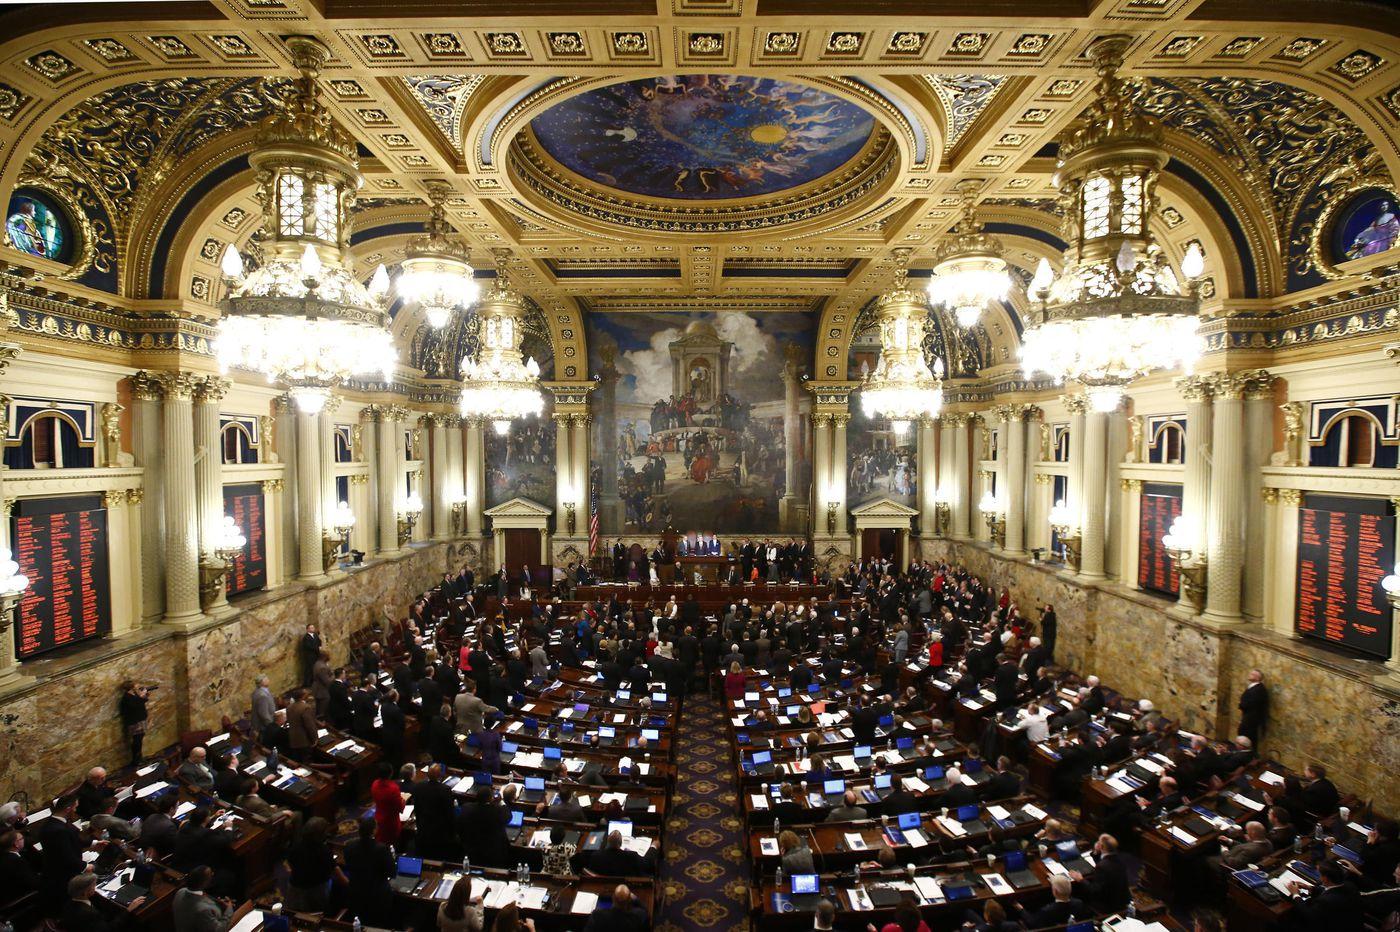 Two Pa. House and Senate leaders (sorta) defend our lackluster legislature | John Baer